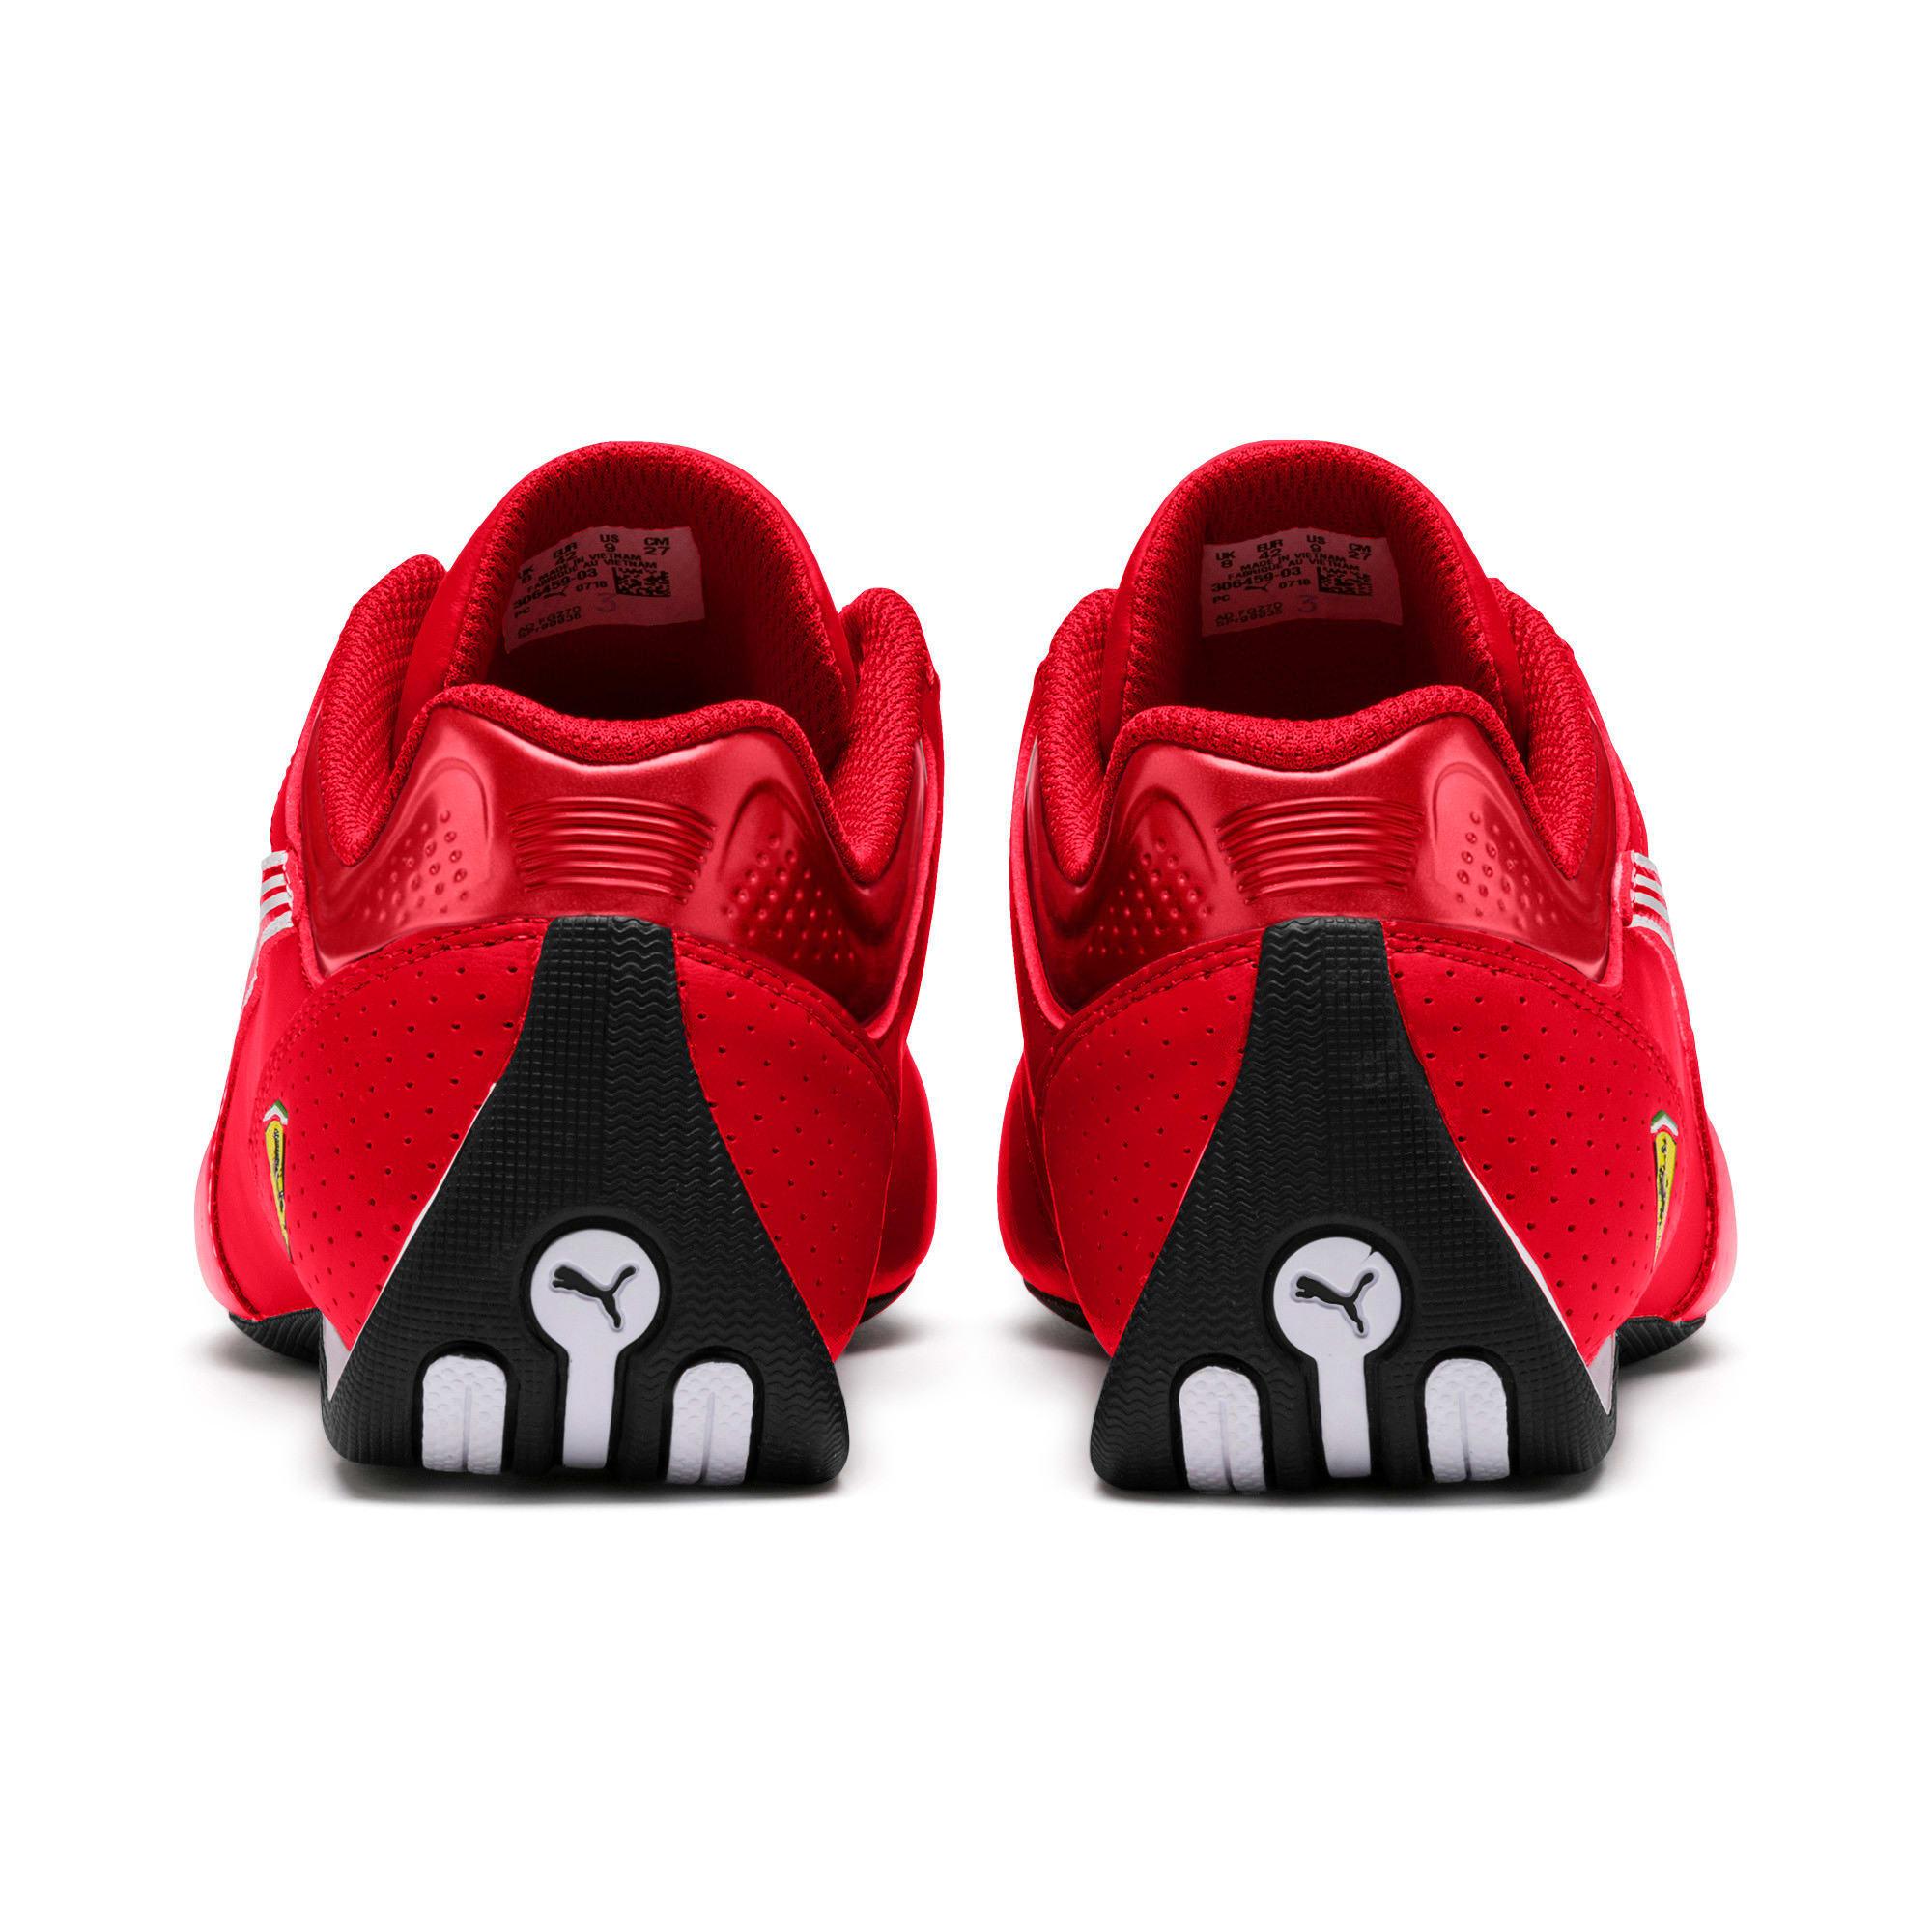 Thumbnail 5 of Ferrari Future Kart Cat Trainers, Rosso Corsa-Puma Black, medium-IND